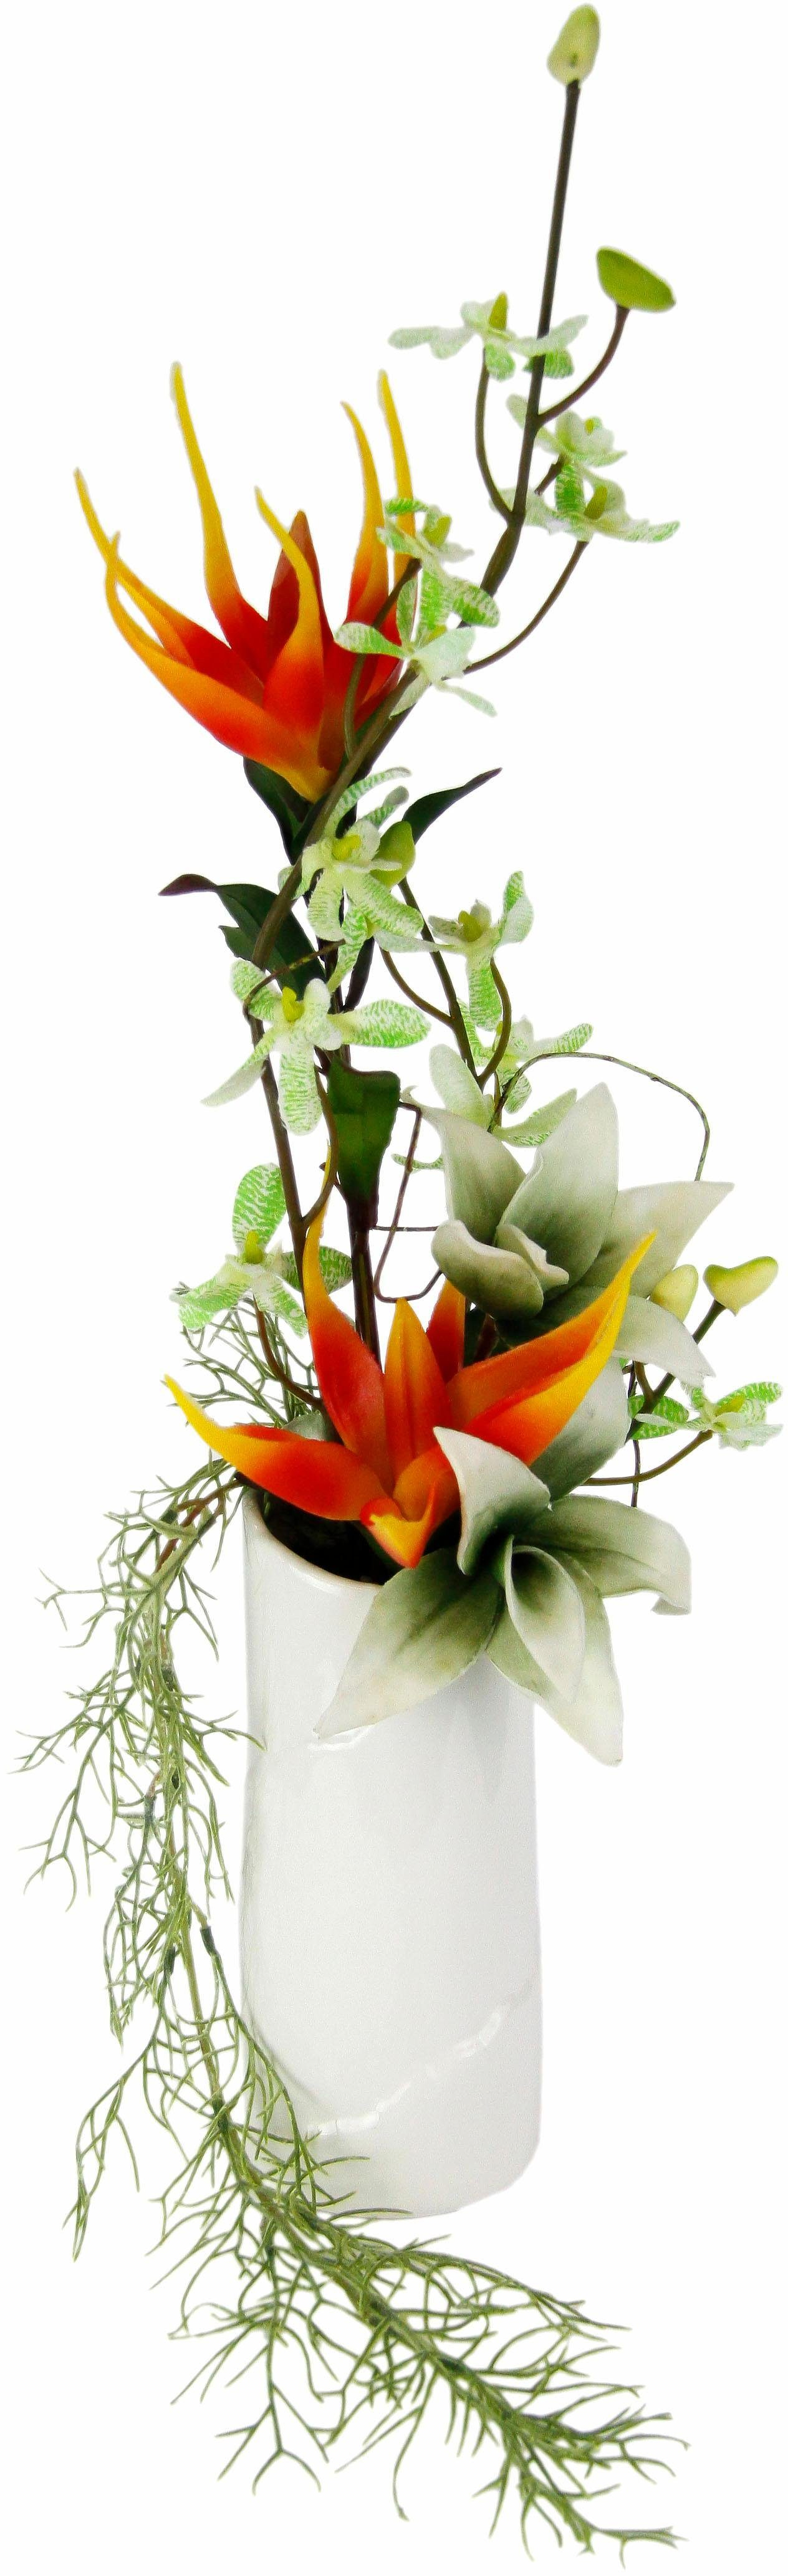 Home affaire Kunstblume »Exoten« in Vase